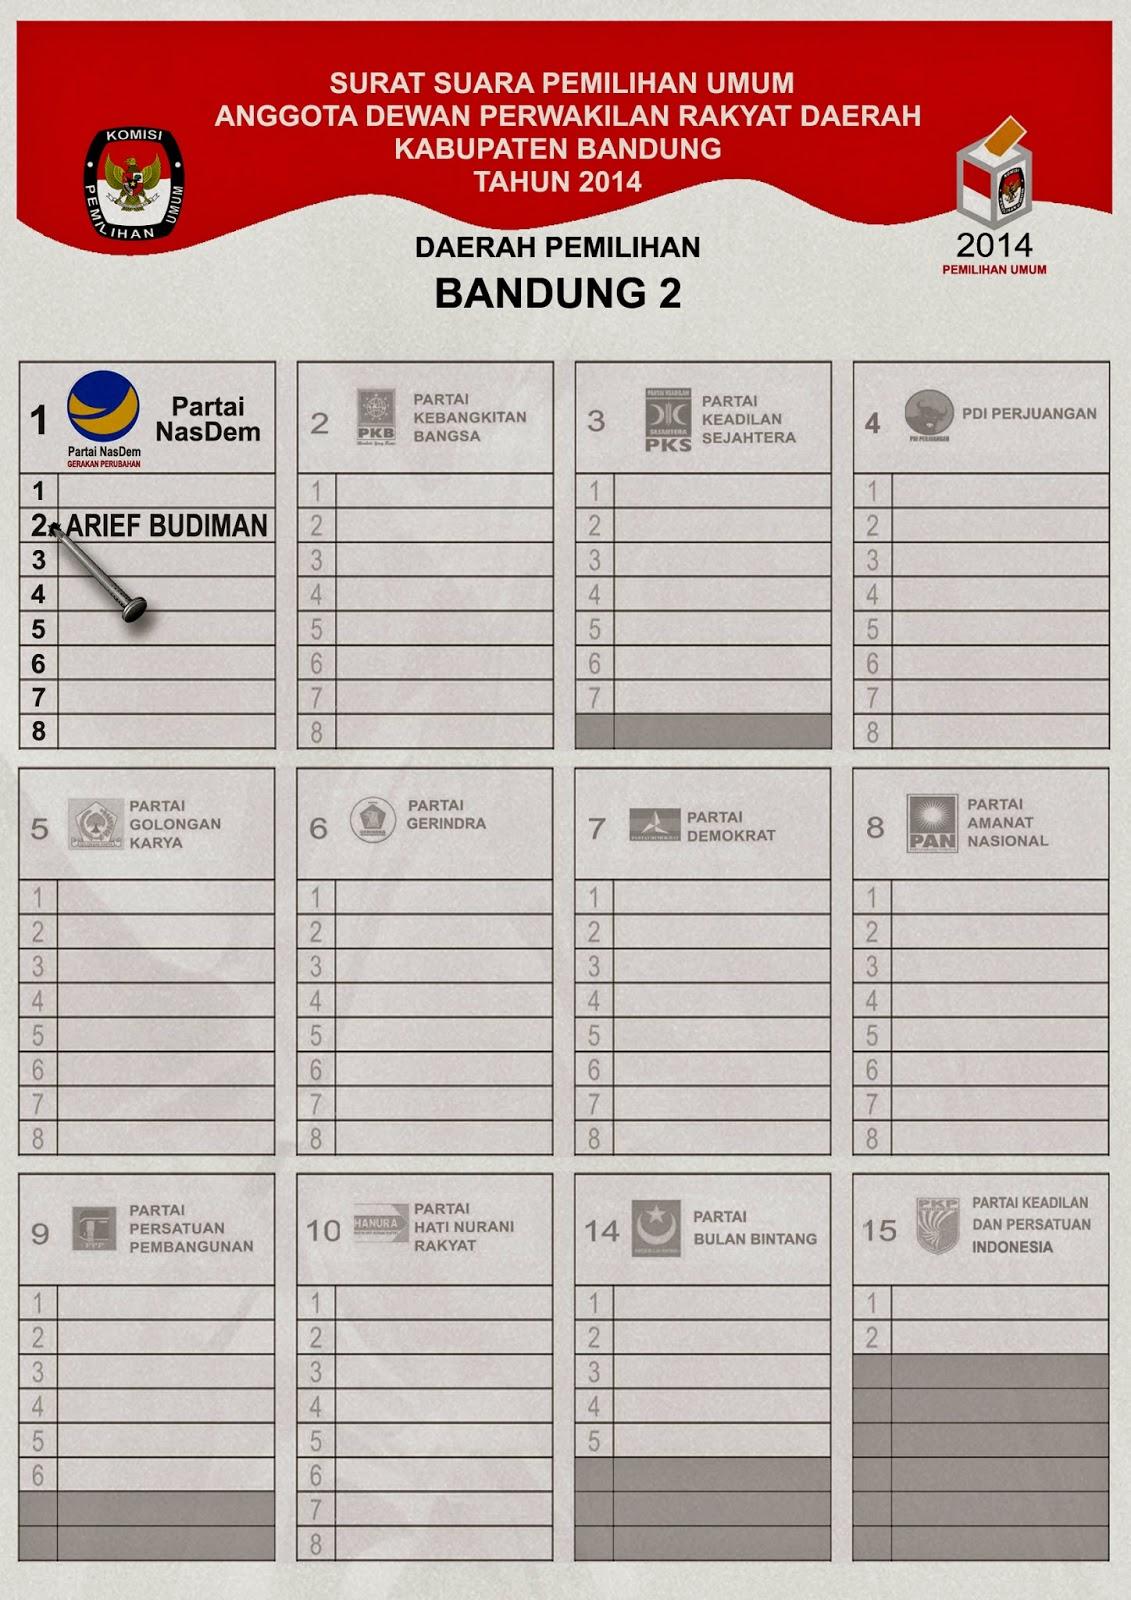 Daerah Pemilihan Bandung 2 (Margaasih, Margahayu, Katapang